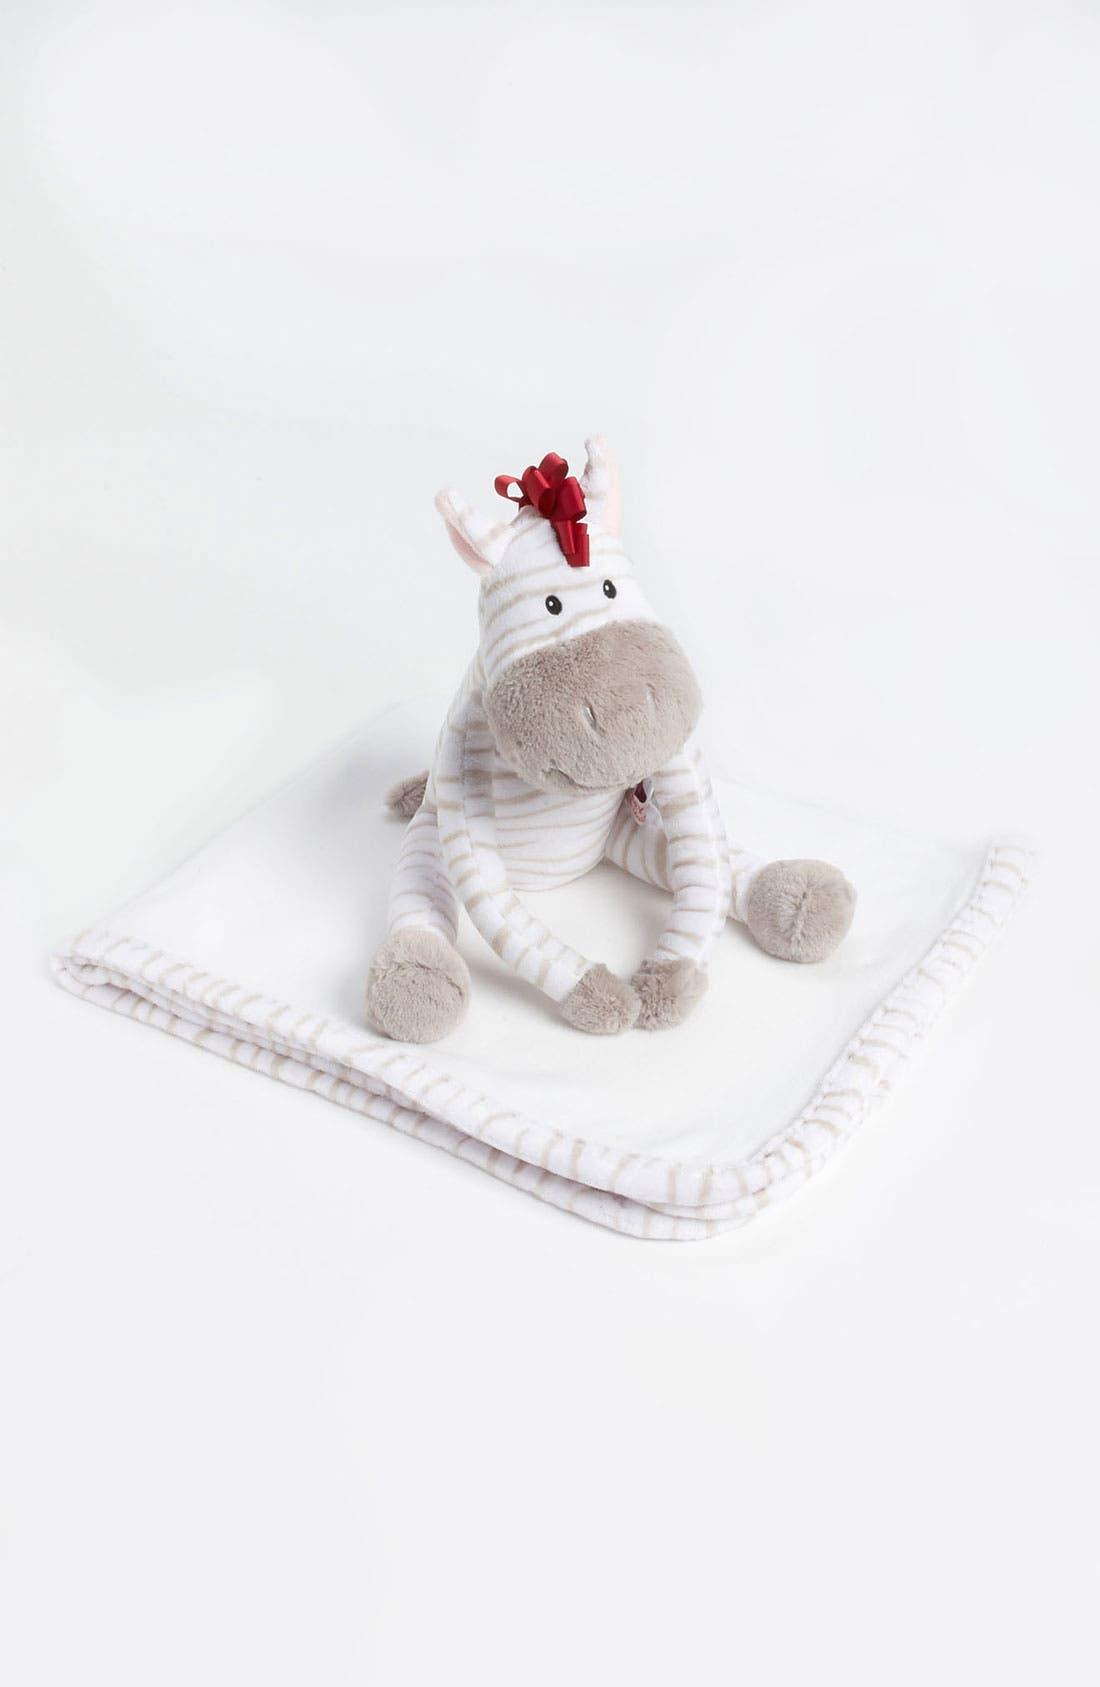 Alternate Image 1 Selected - Baby Aspen 'Zoey The Zebra' Stuffed Animal & Blanket (Baby)